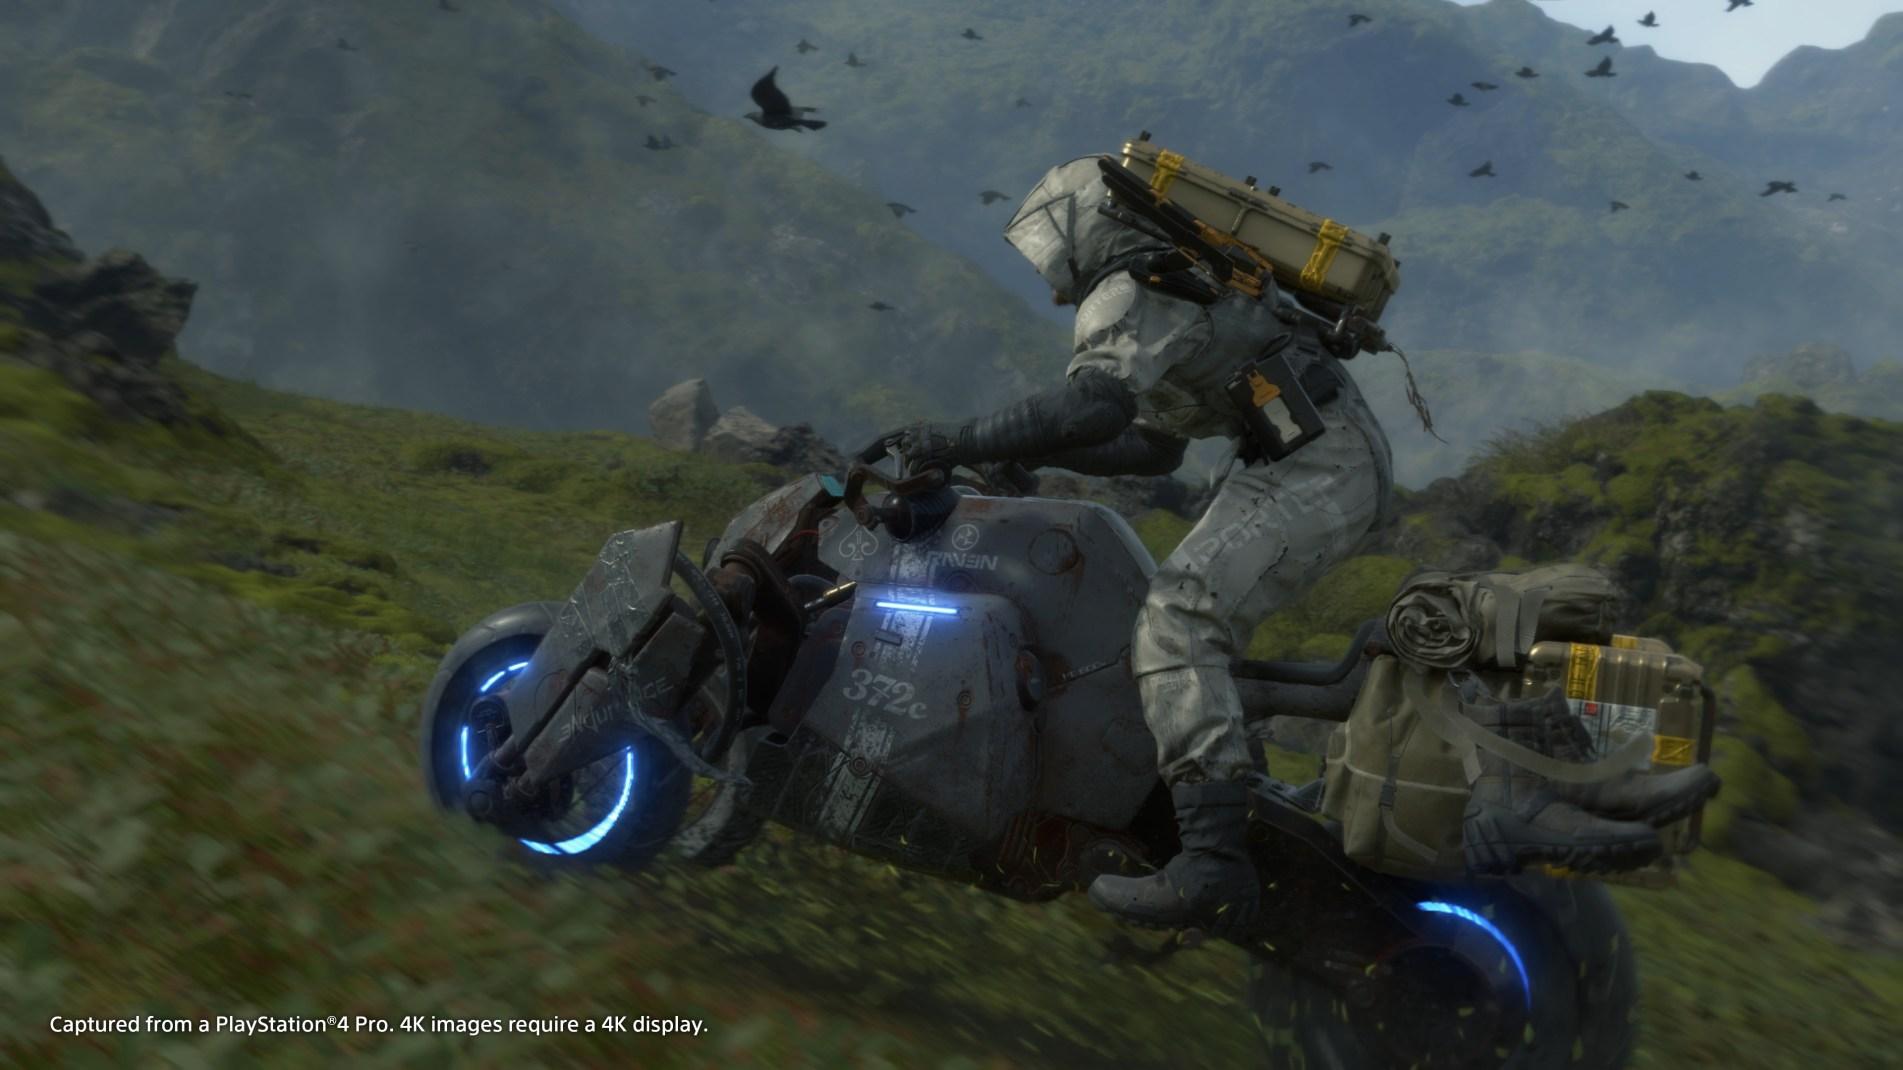 Sam moves through the landscape via a Motorbike.